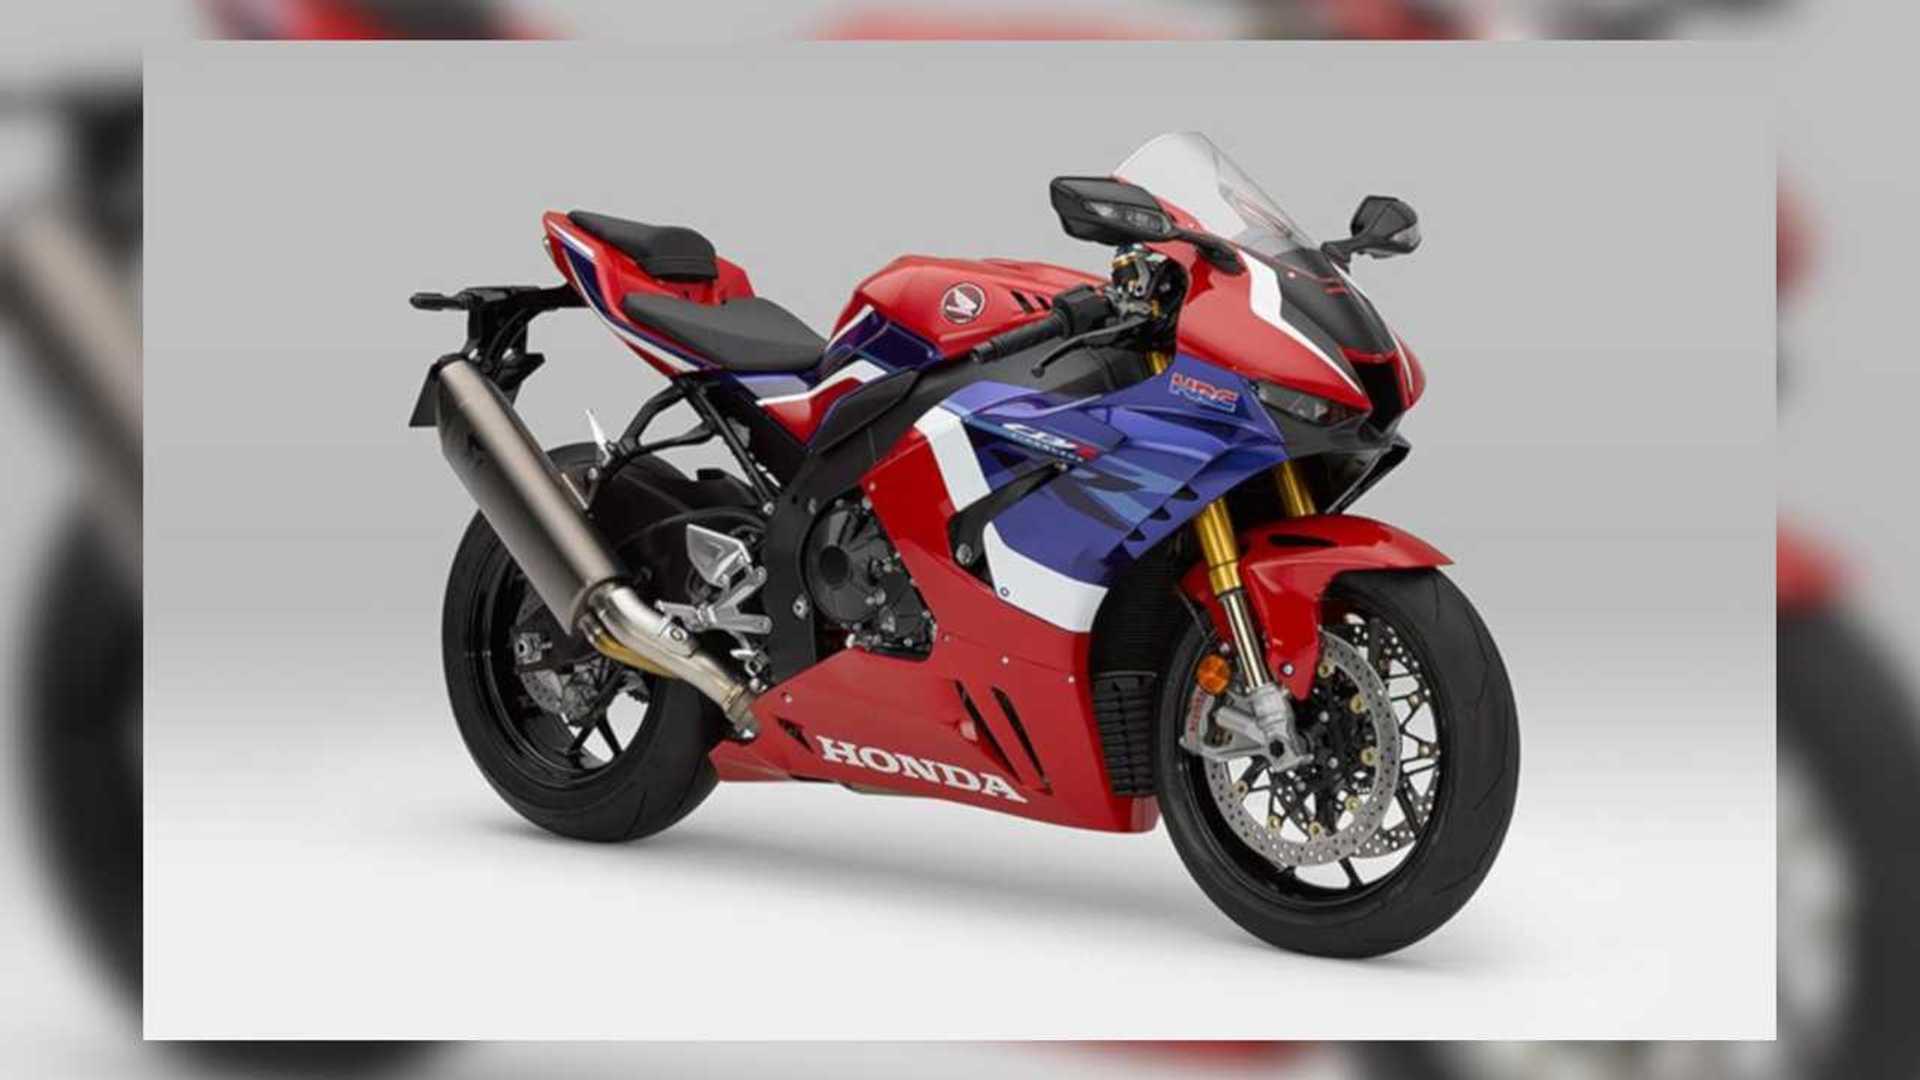 This Is The 2020 Honda CBR1000RR-R Fireblade And Fireblade SP